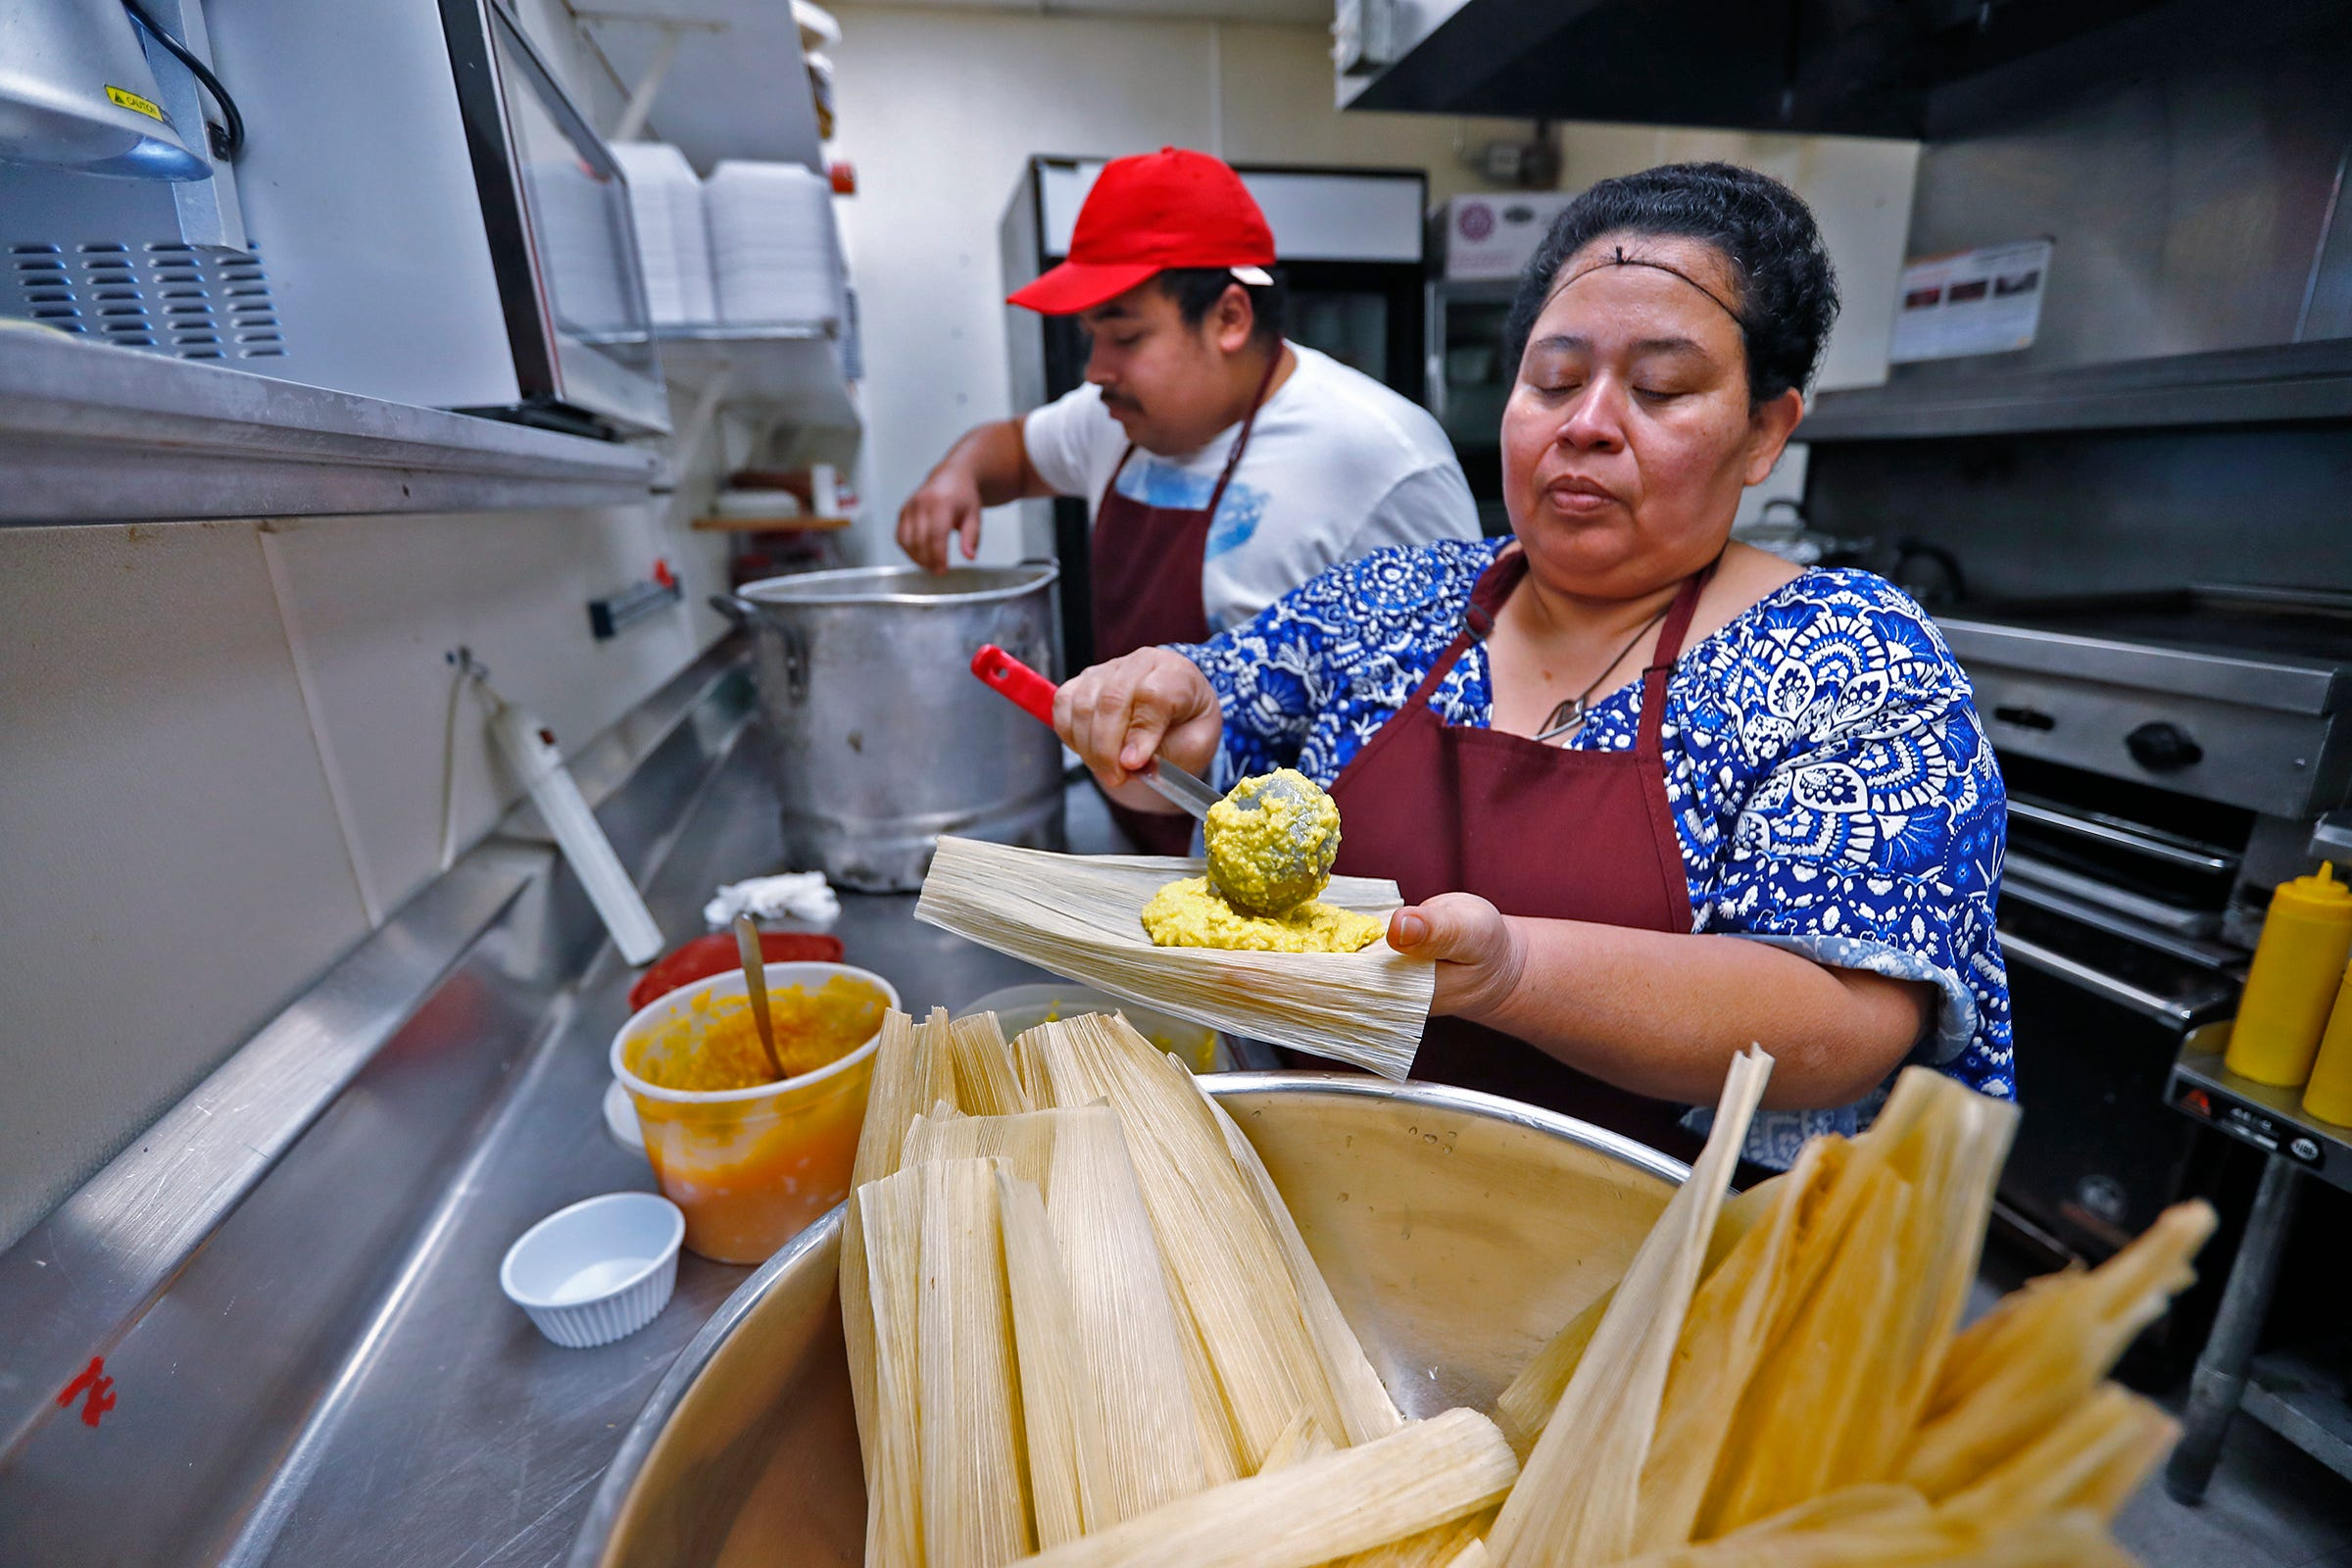 Latinos splitting in the kitchen